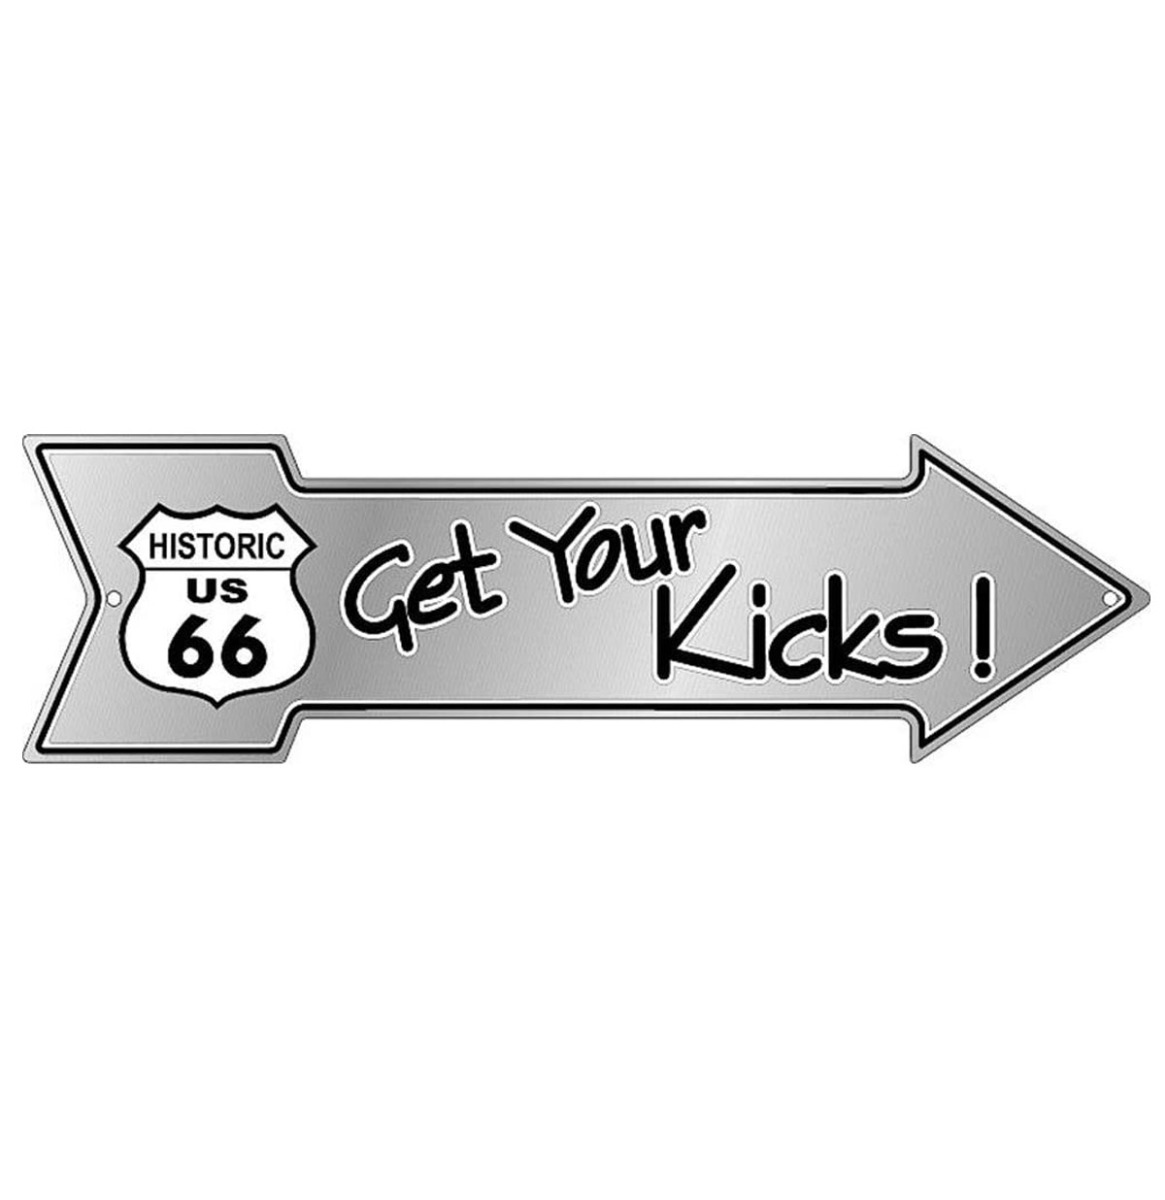 Get Your Kicks! Pijl Bord Aluminium - Historic Route 66 50 x 14,5 cm